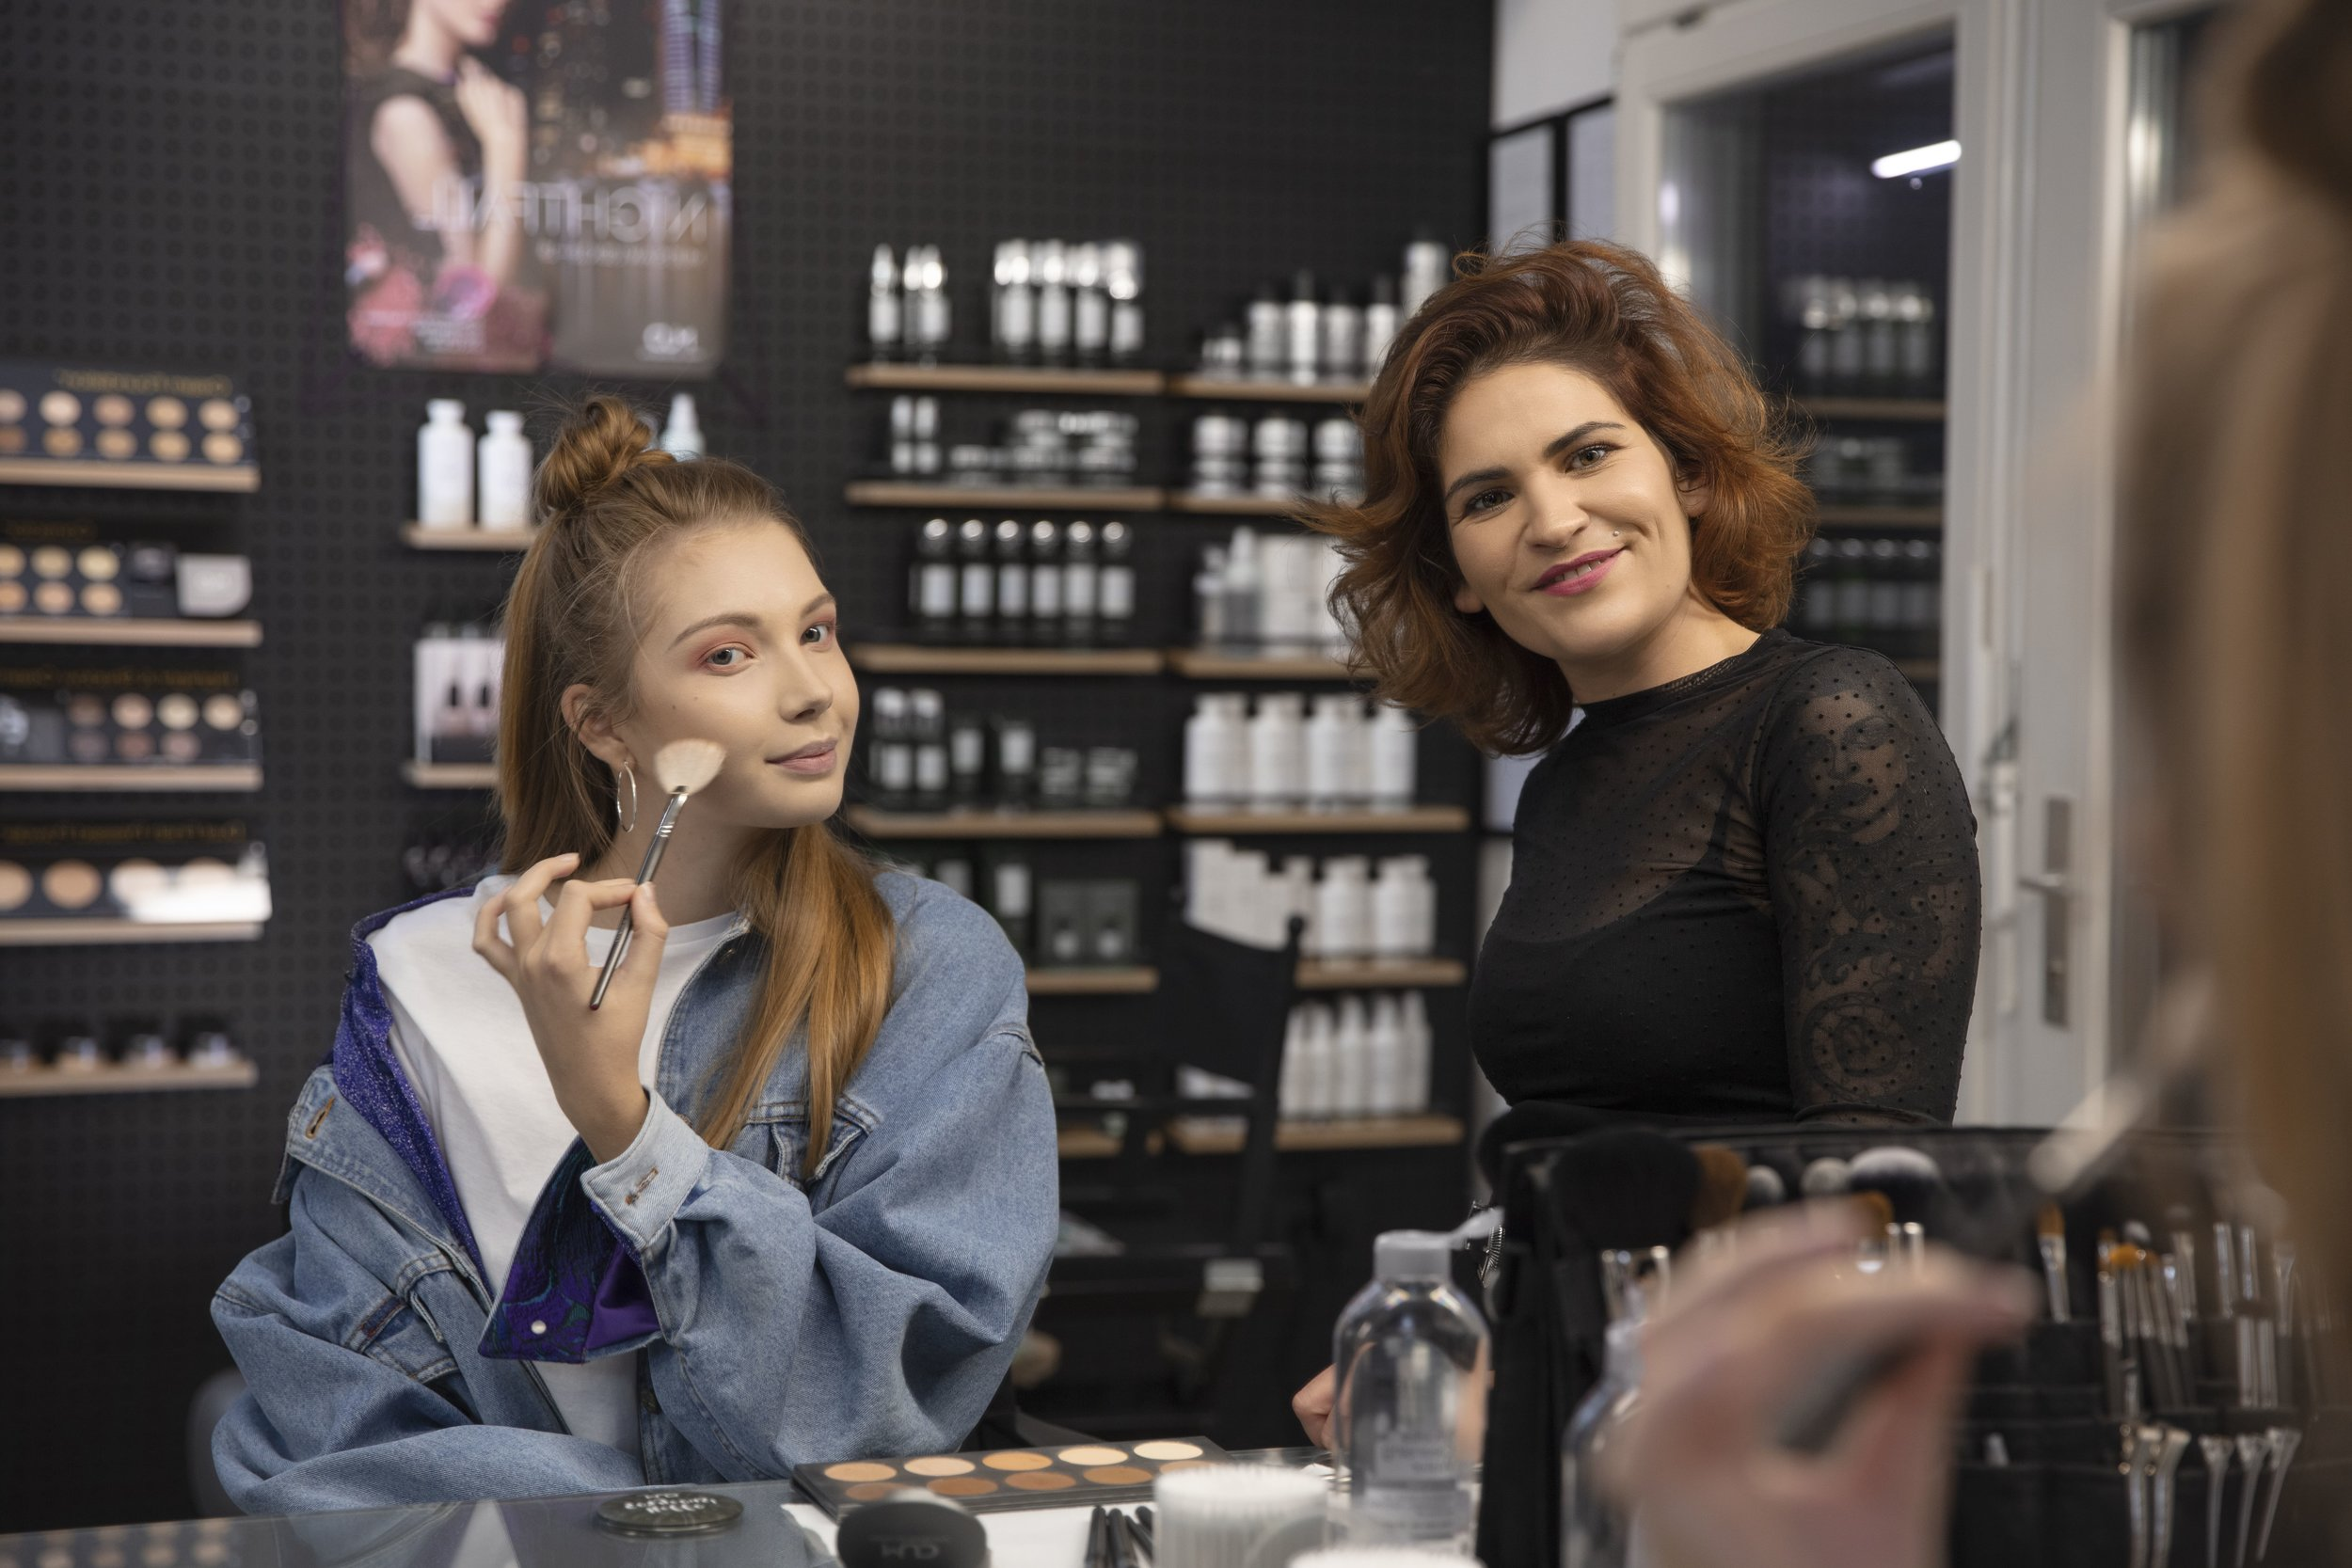 Teen Make-up Workshop - EXP_ (1).jpg